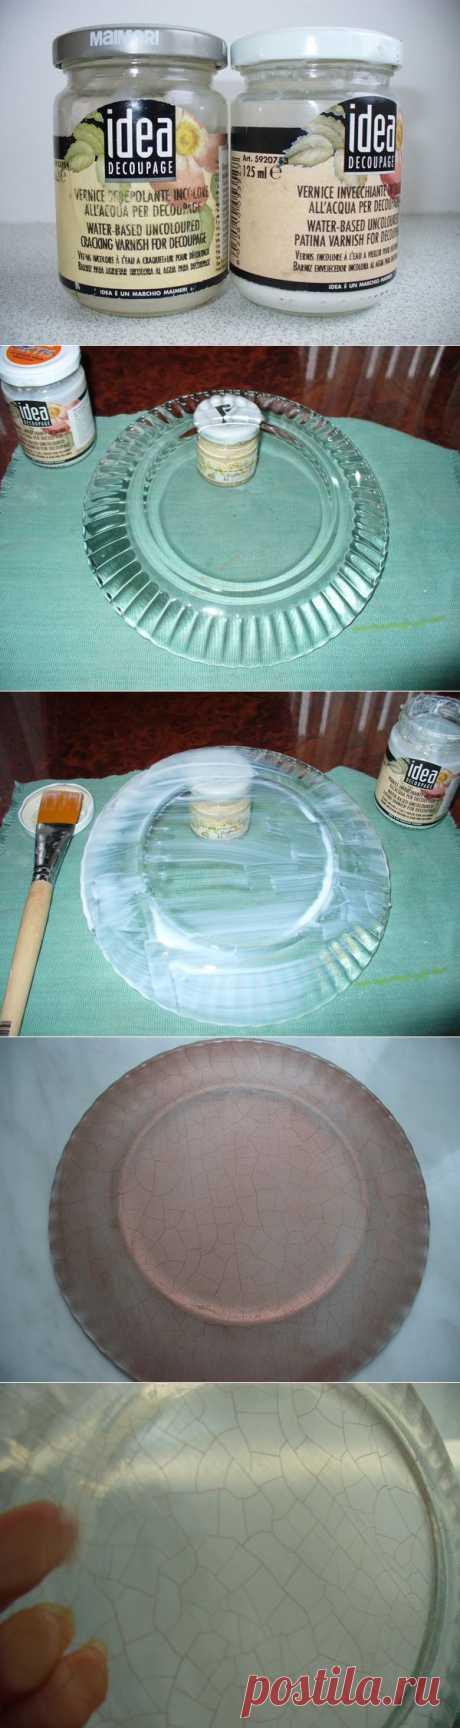 Мастер-класс по созданию кракле на стеклянной тарелочке.